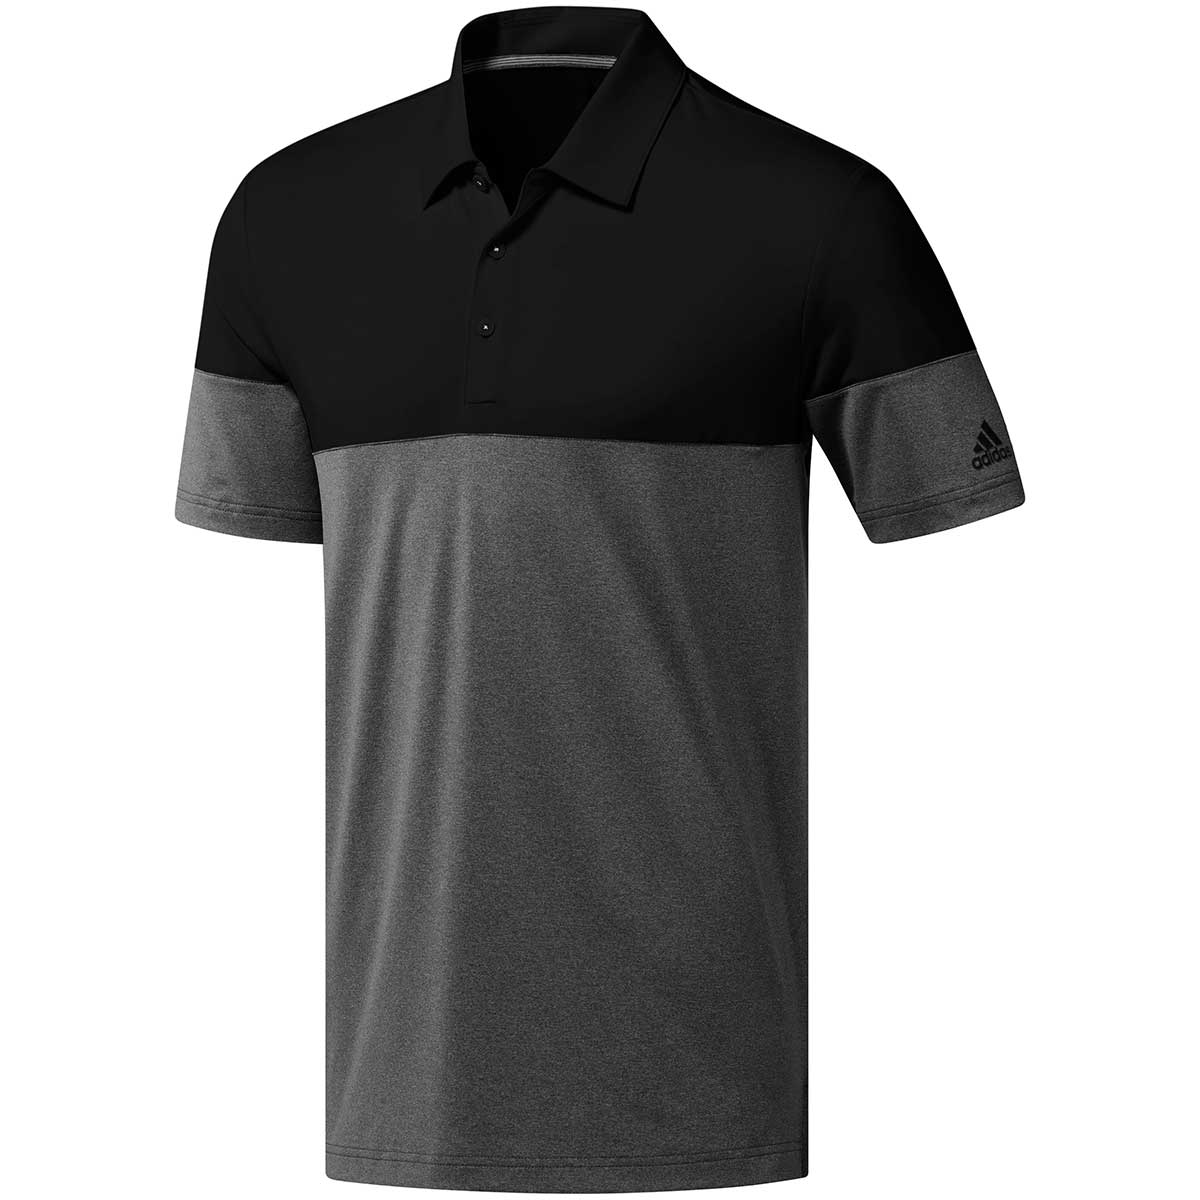 Adidas Ultimate365 Heather Blocked Polo Shirt - Black/Grey Five